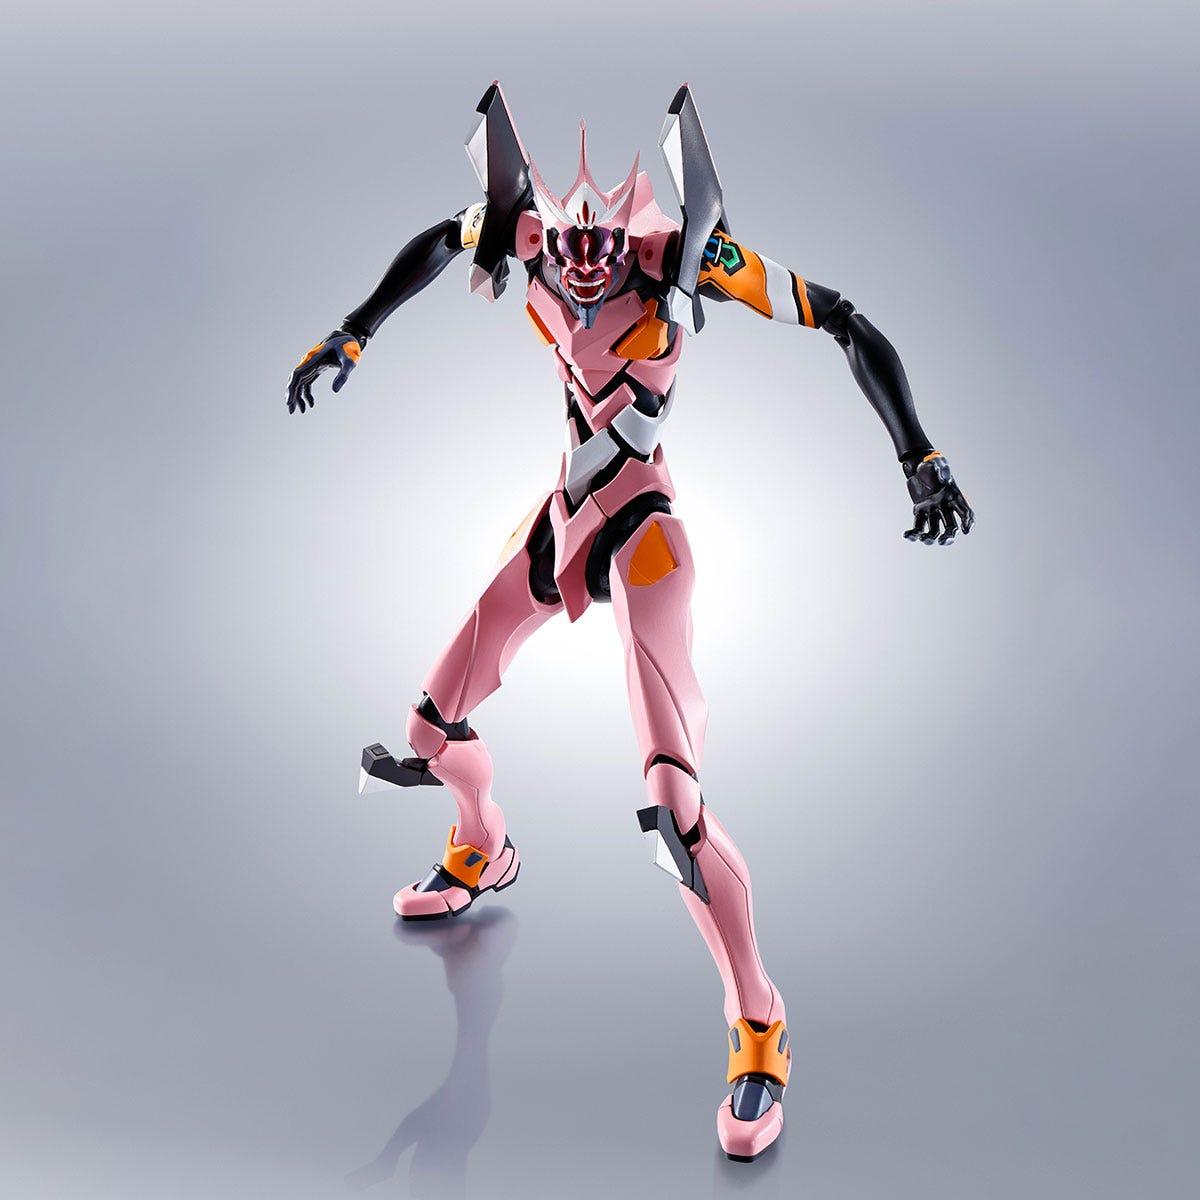 "Bandai Spirits ROBOT Spirits (SIDE EVA) Evangelion Production Model-08 ""Evangelion:3.0+1.0 Thrice Upon a Time"""